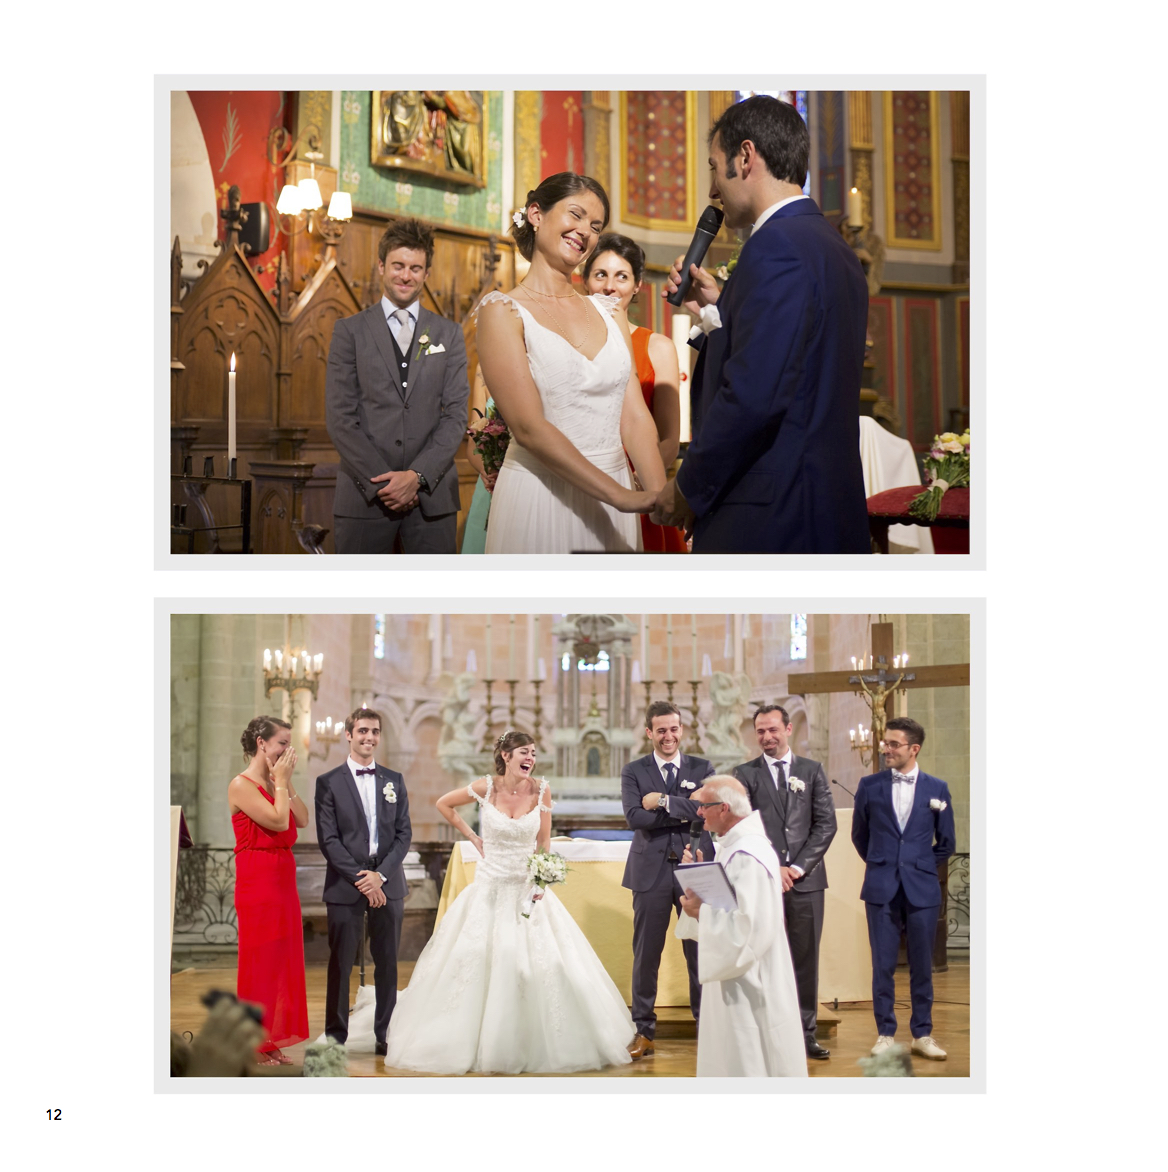 SALON DU MARIAGE 2016 14.jpg